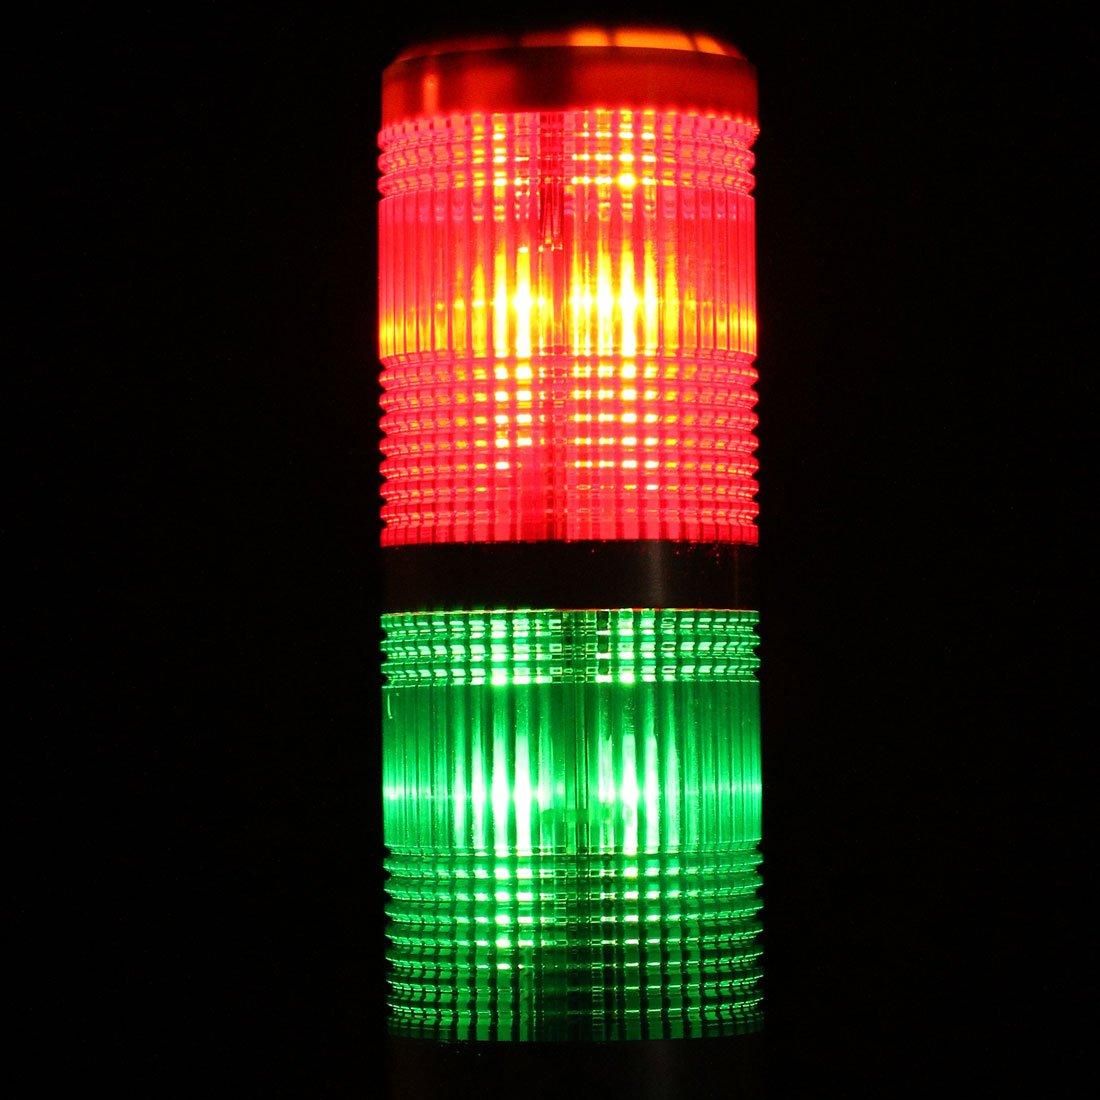 uxcell Warning Light Bulb Super Bright Industrial Signal Alarm Lamp DC24V Red Green TB50-2T-E